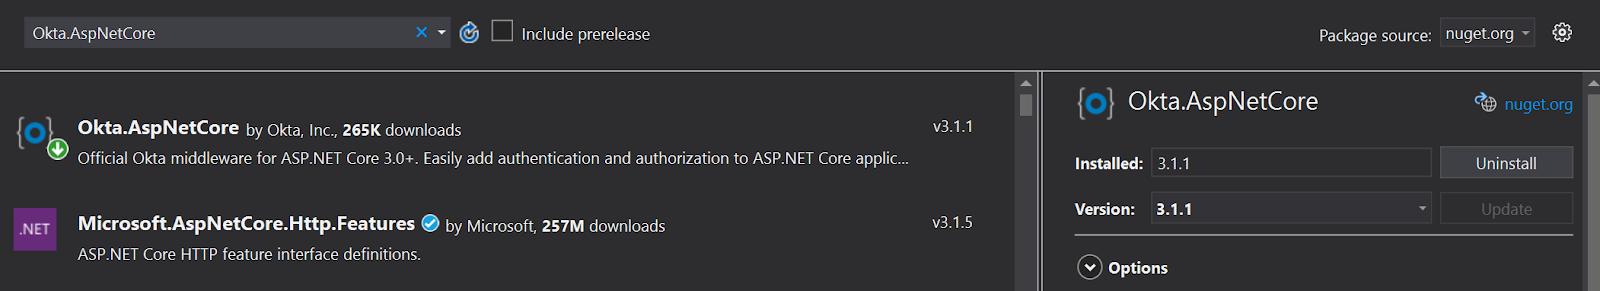 Install Okta .NET Core version 3.1.1.